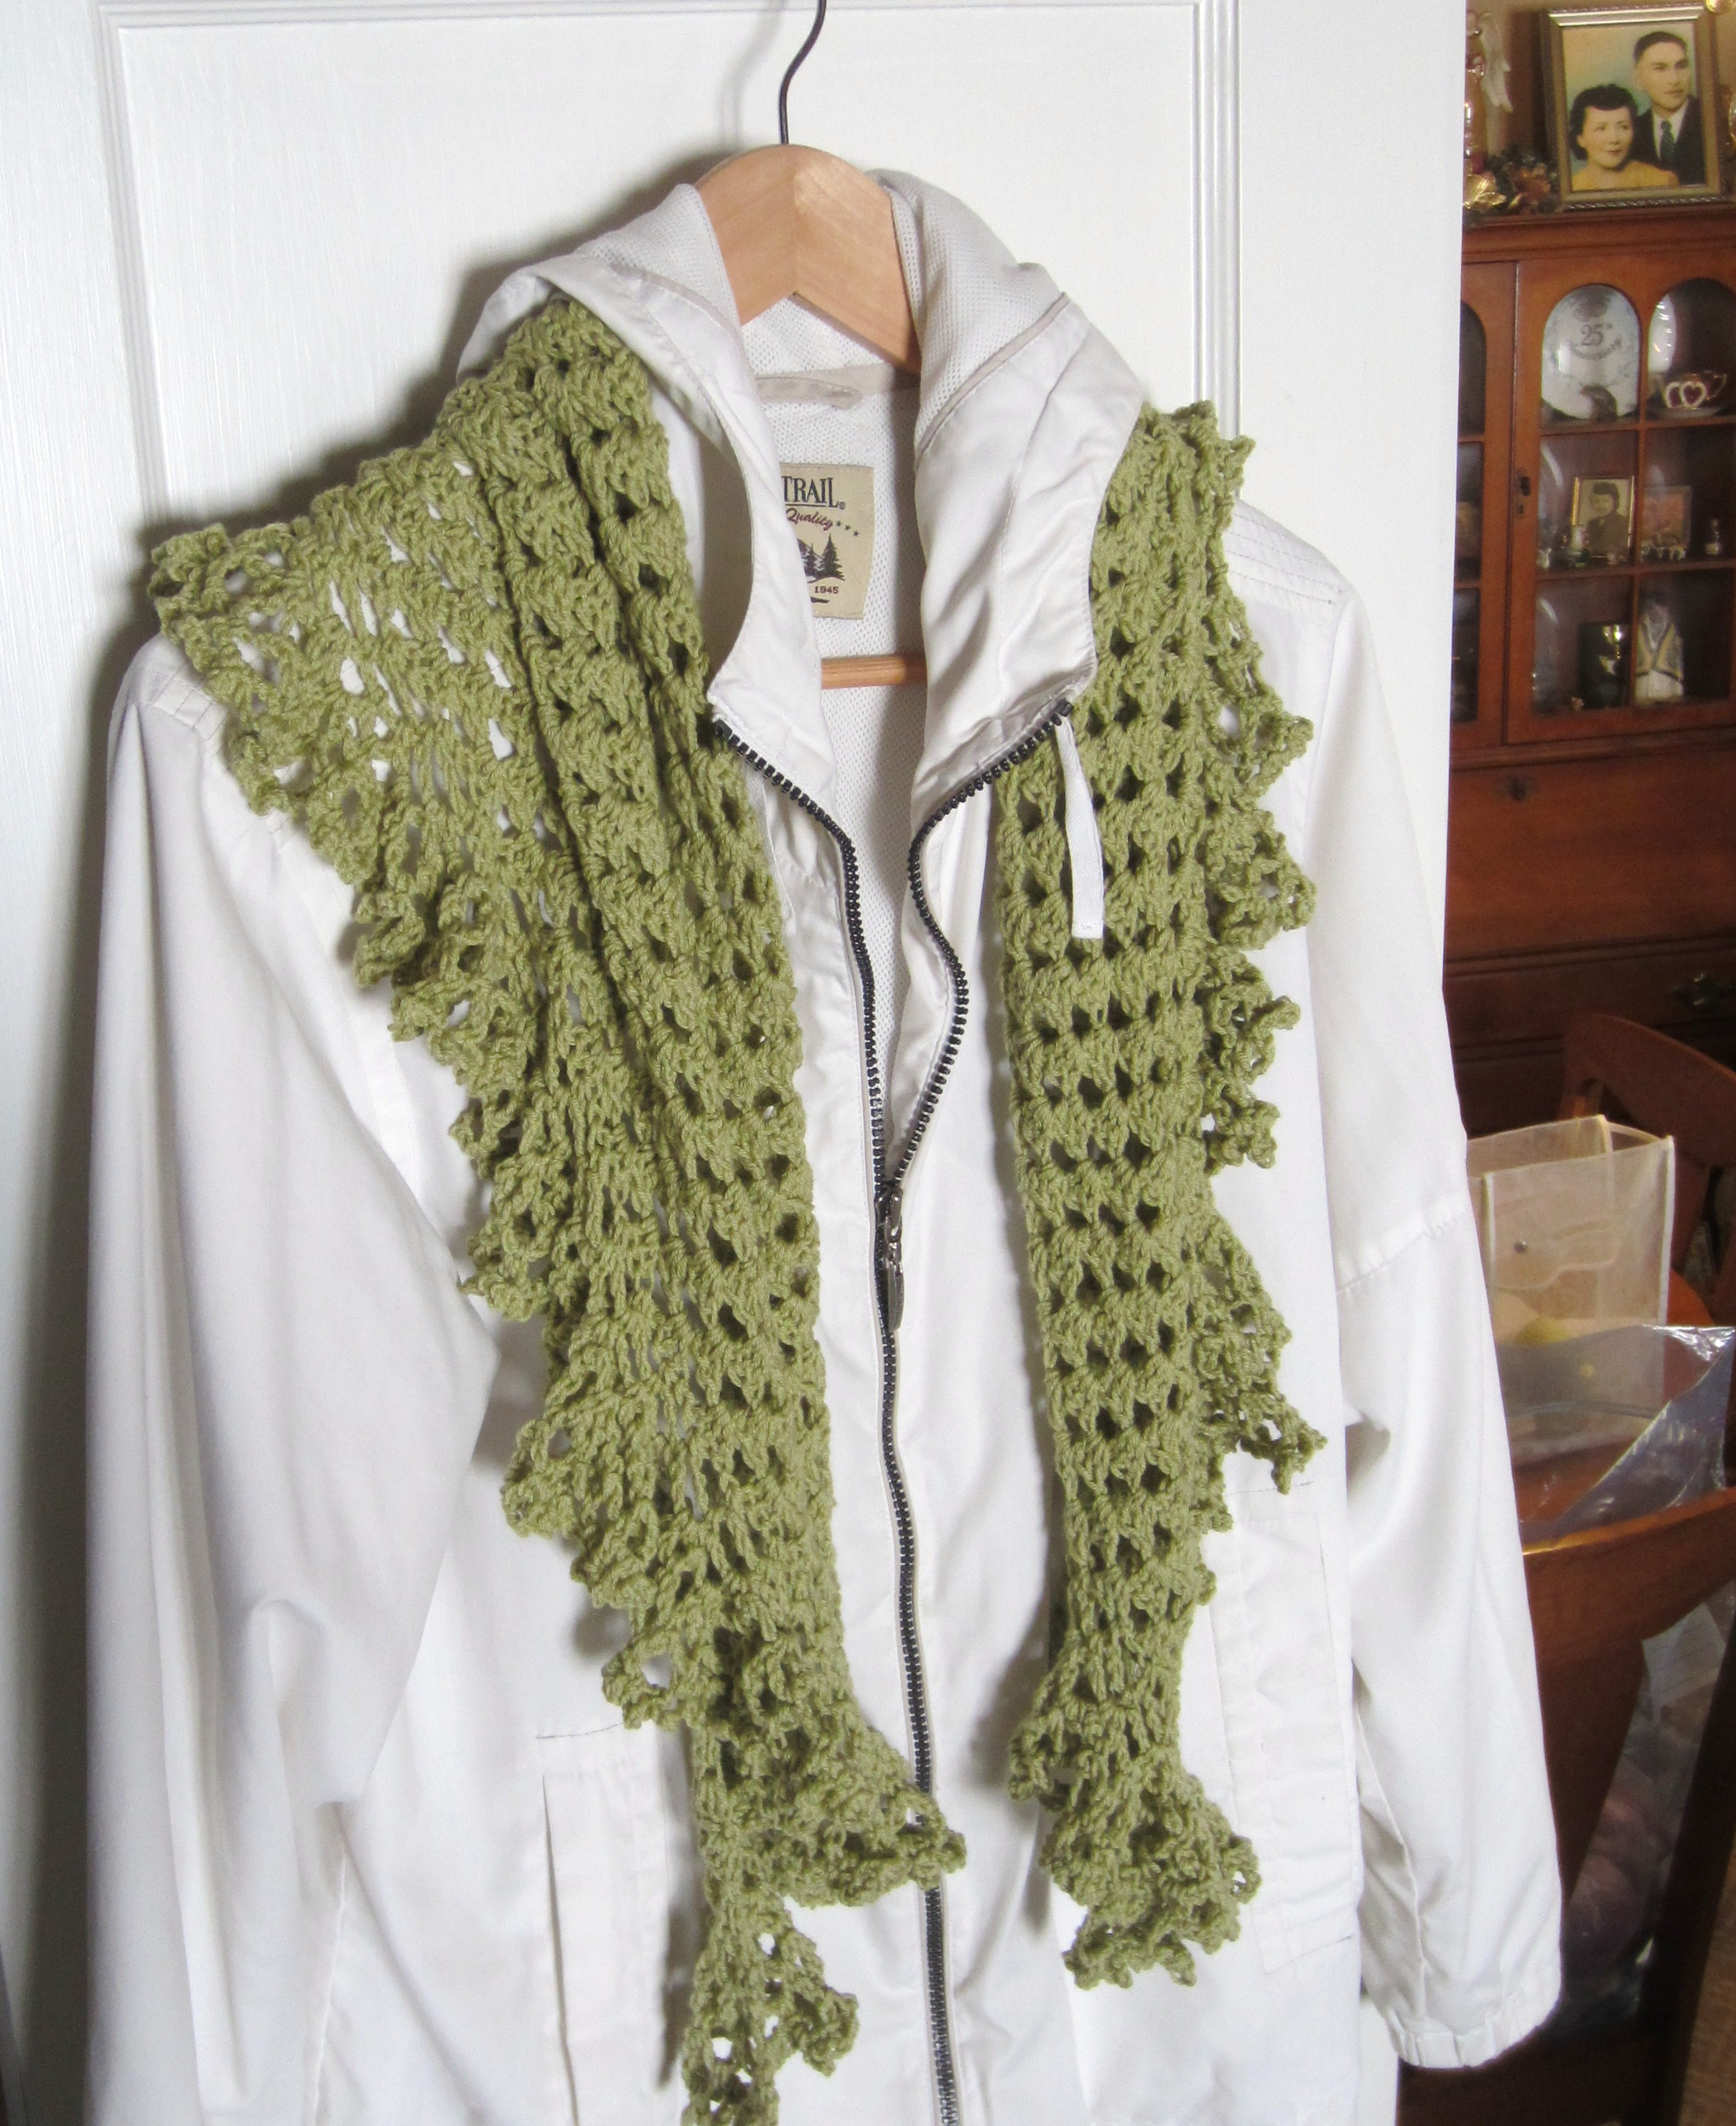 Crocheting Scarf : ruffle border, crochet library, granny scarf, green, shawlette 015